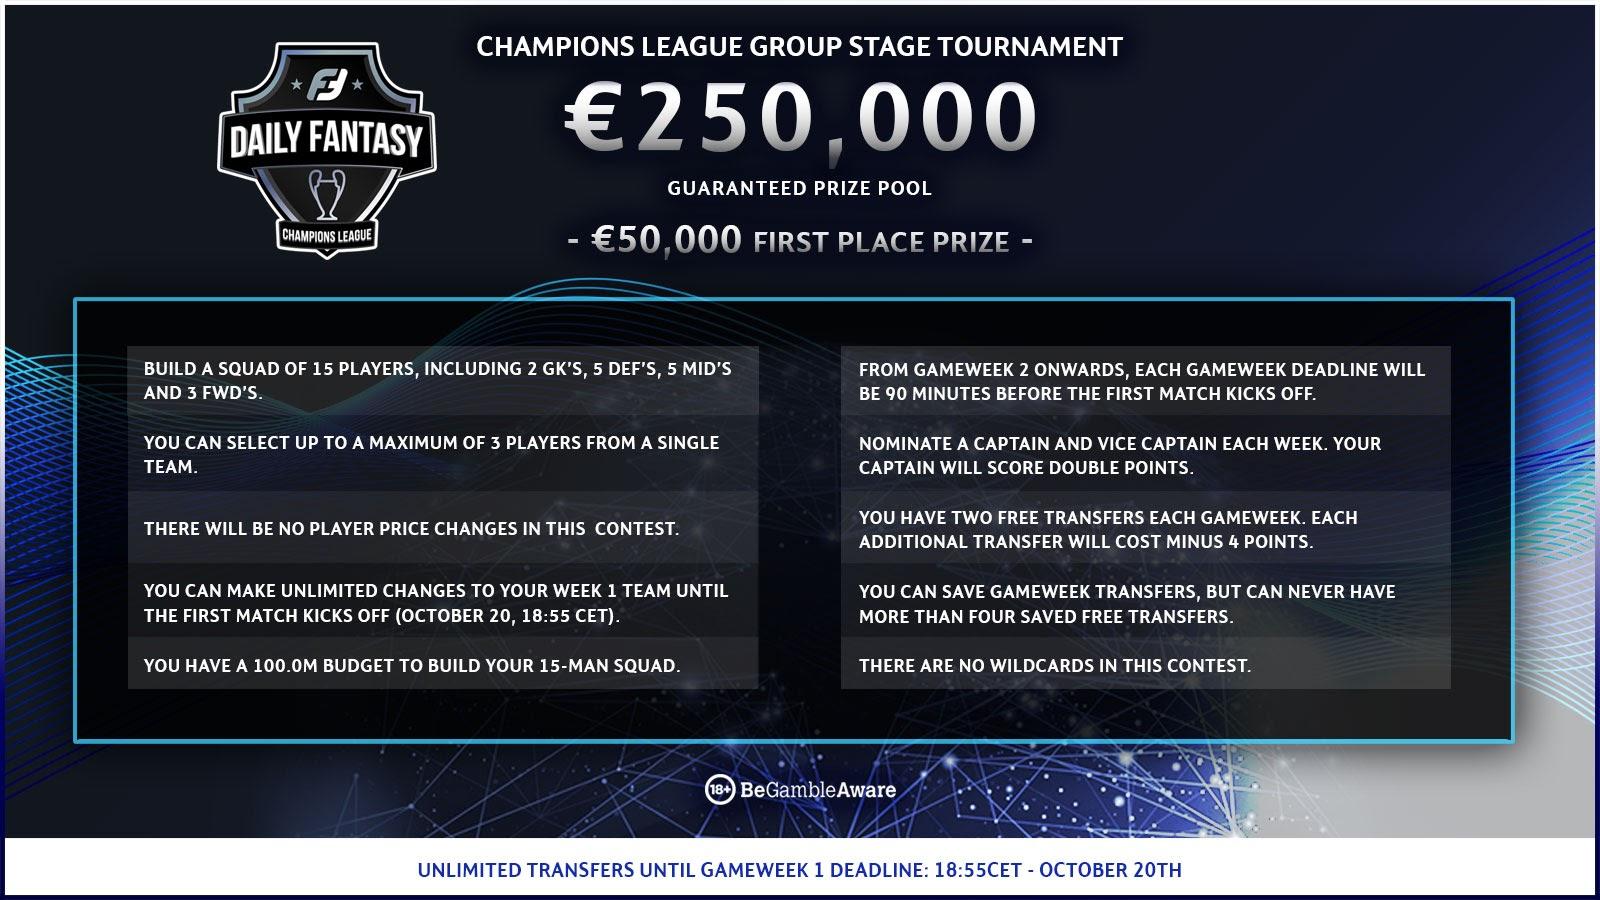 Champions League Fantasy Rules